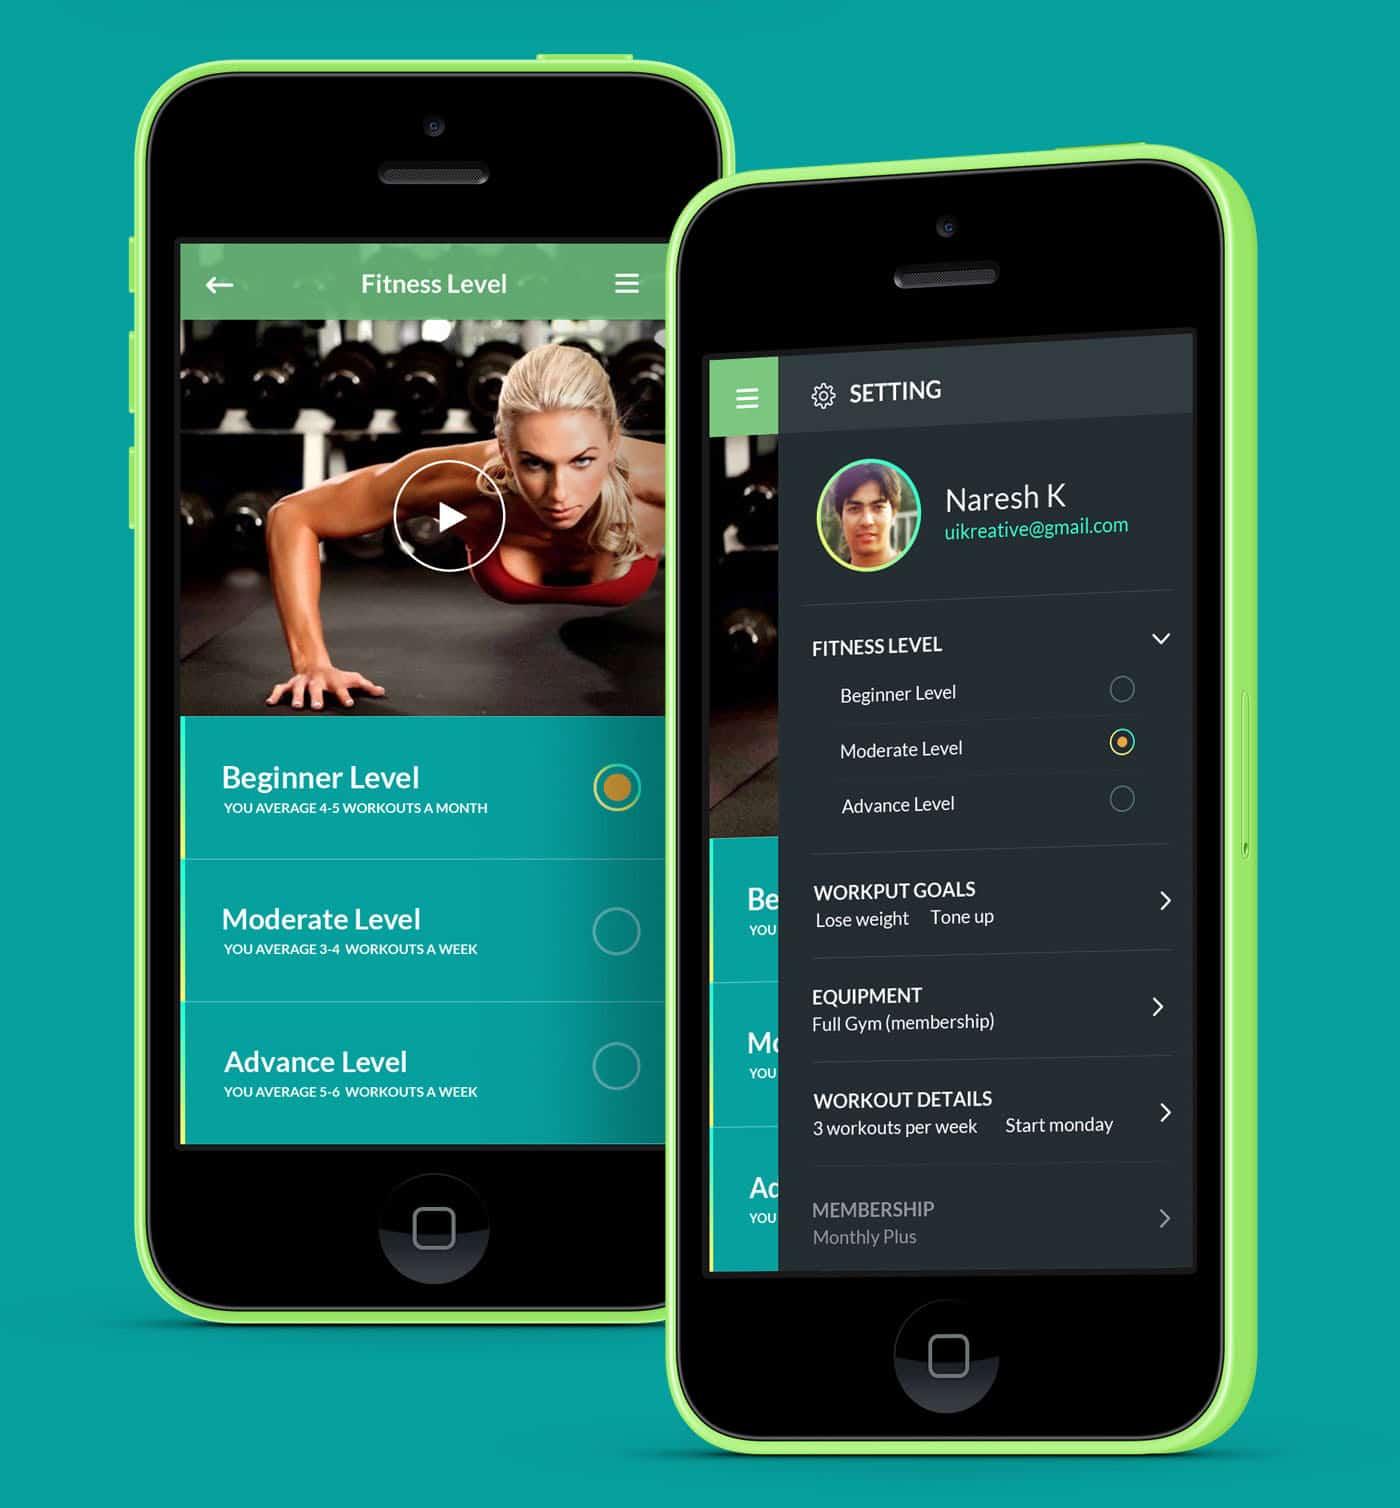 adasse gym workout mobile app by naresh kumar design ideas